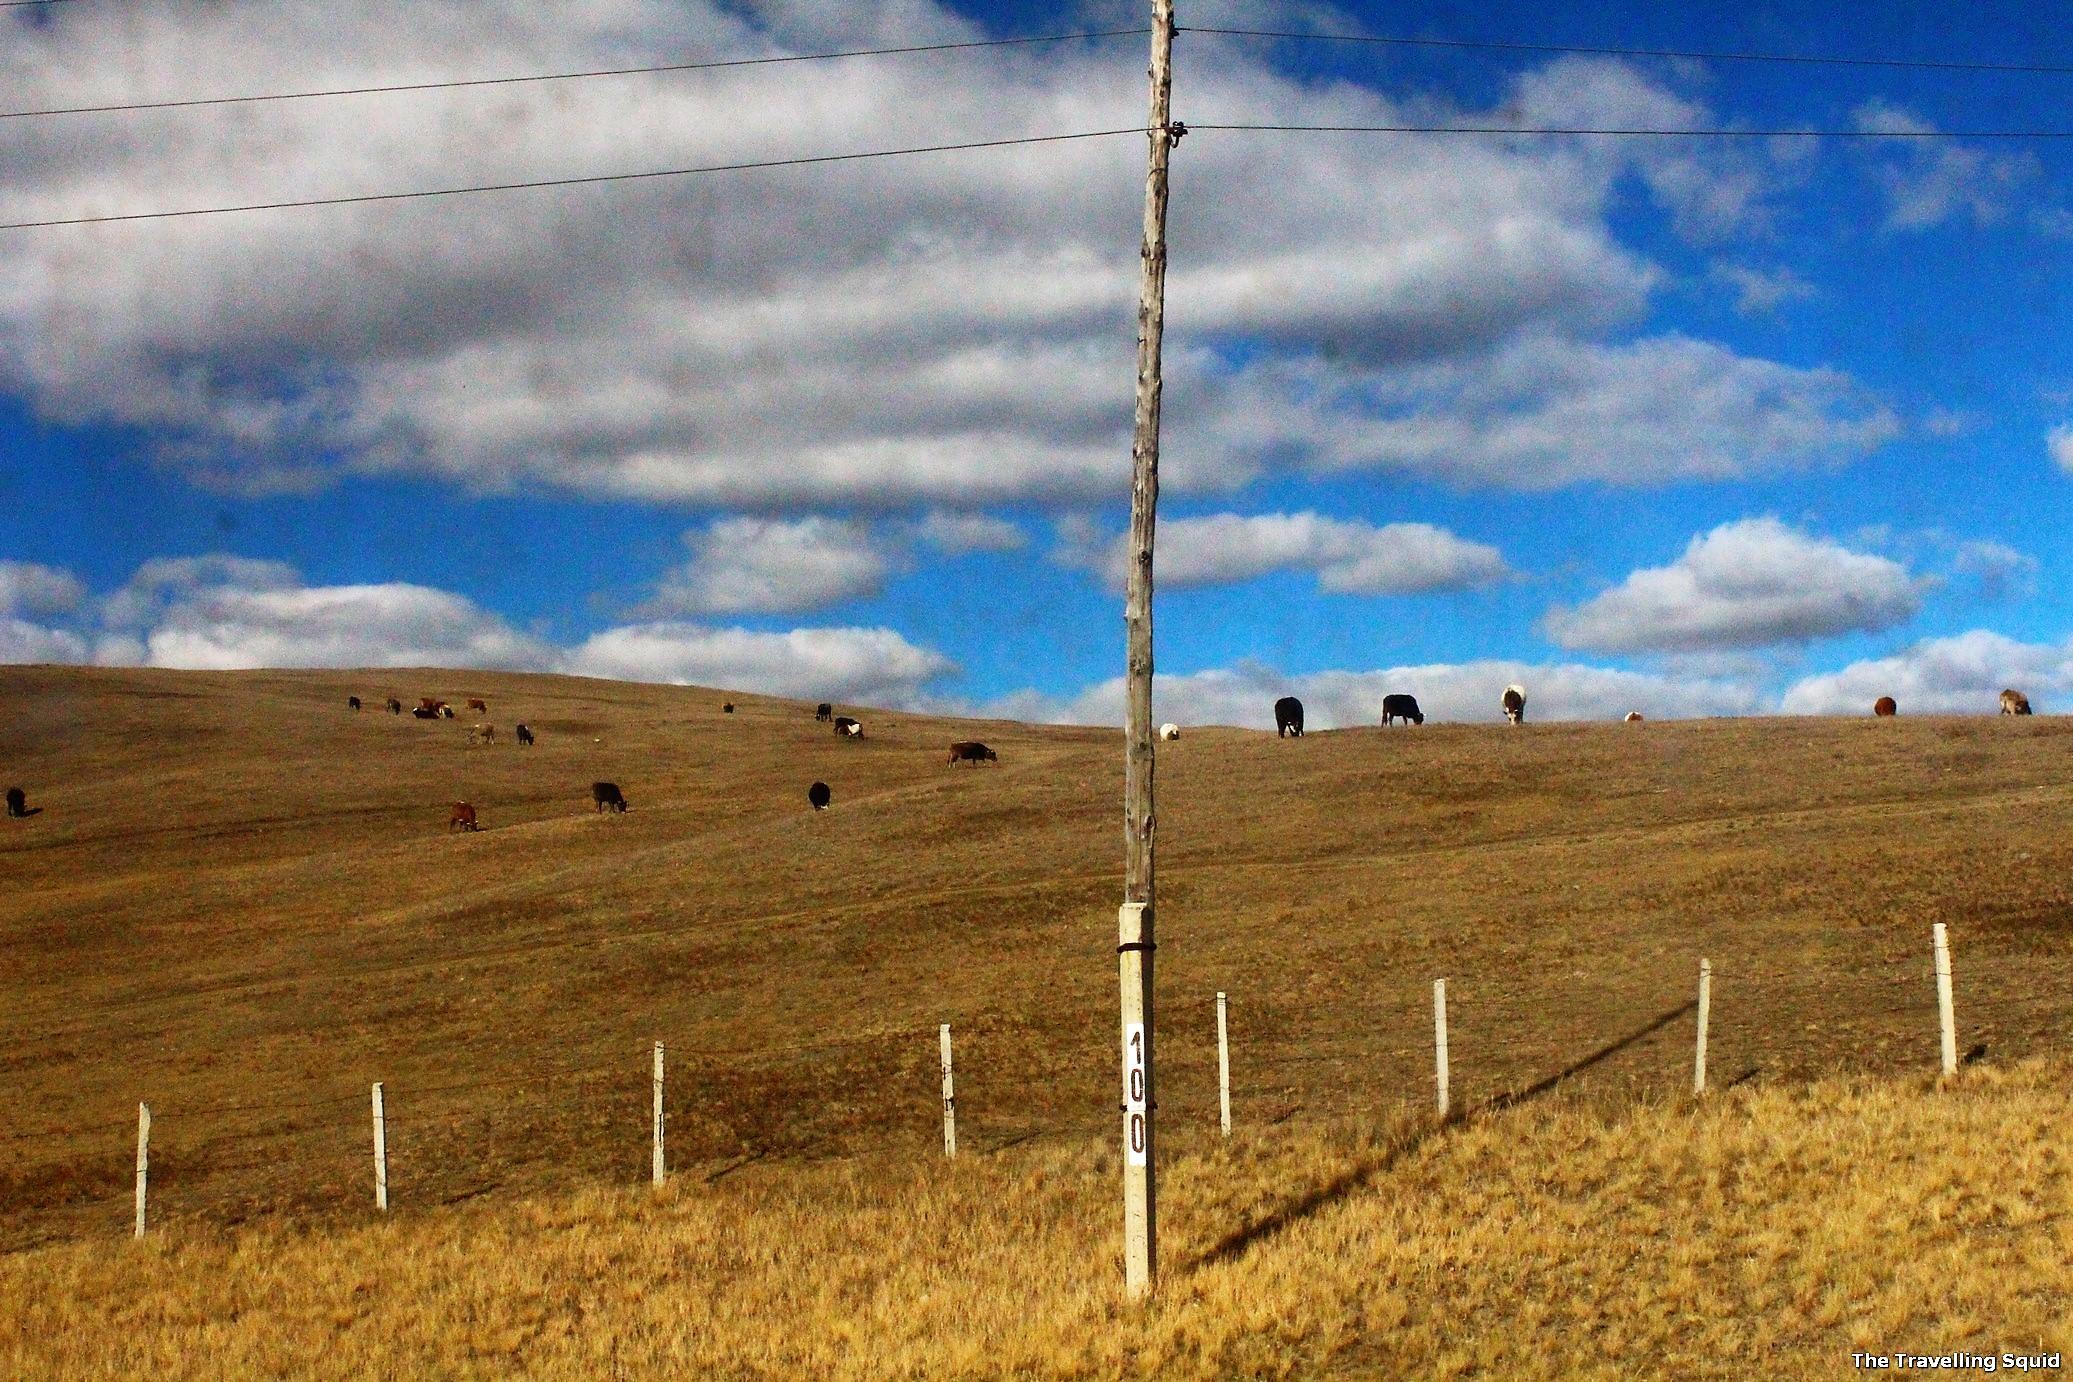 Trans siberian mongolian plains scenery